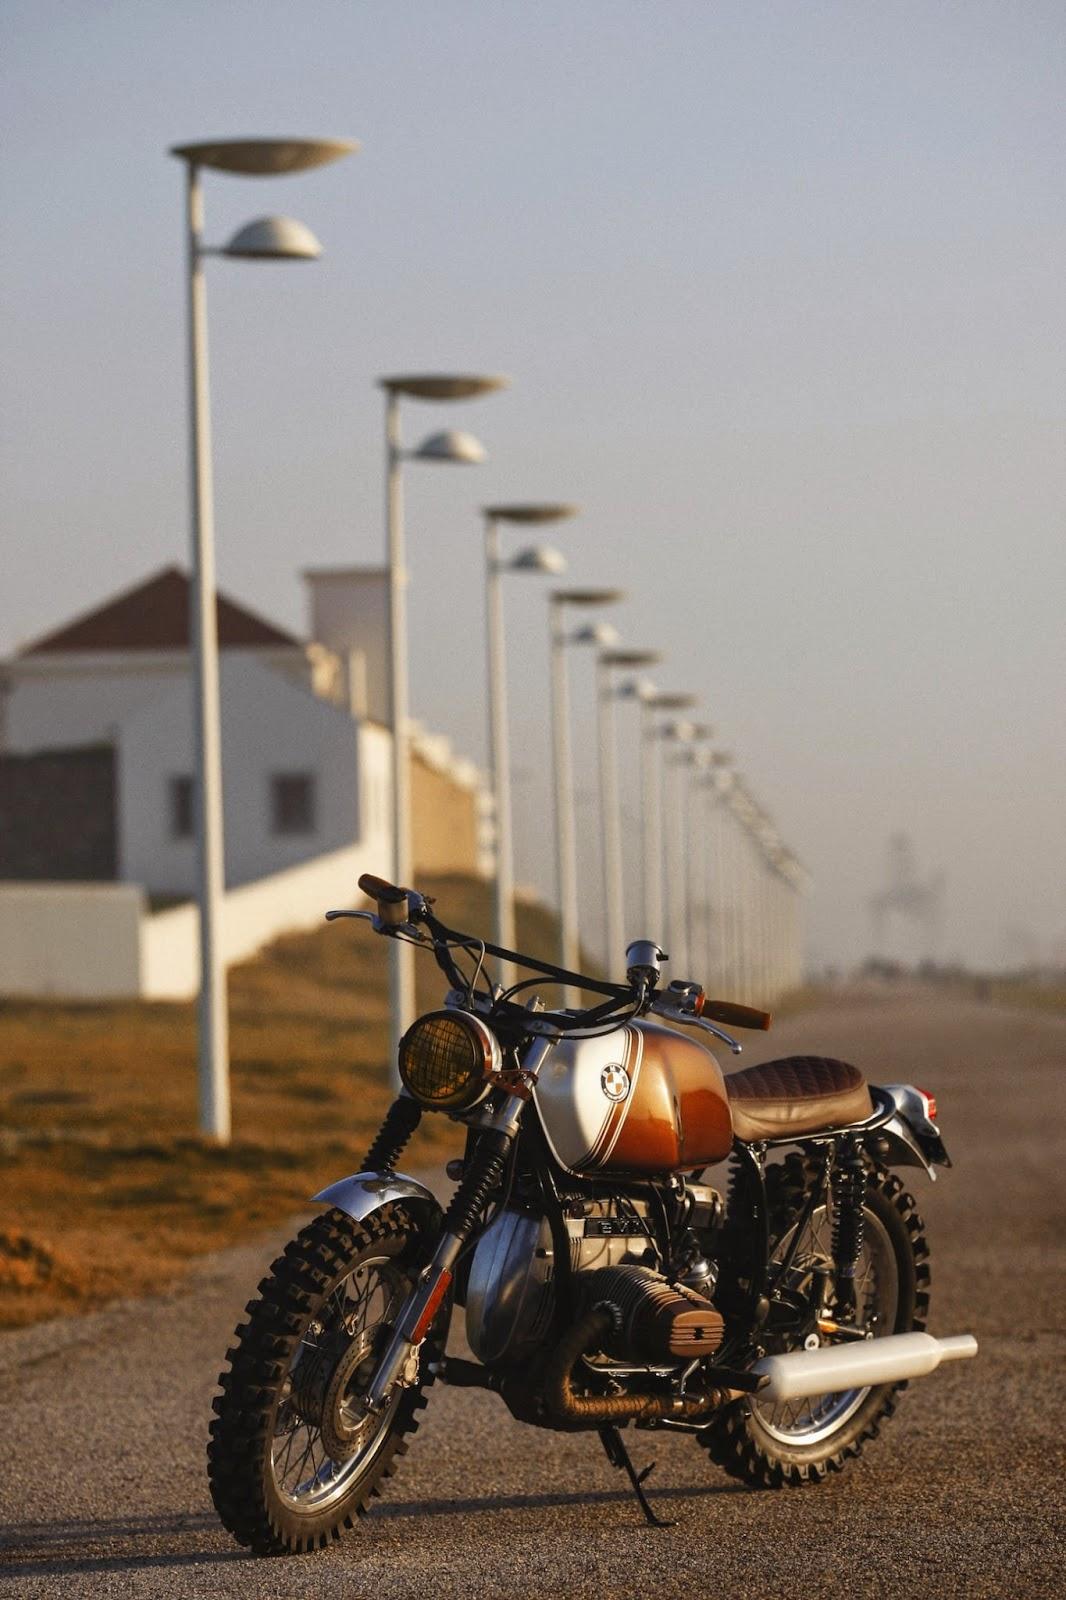 BMW-R45-Custom-Motorcycle-12-1480x2220